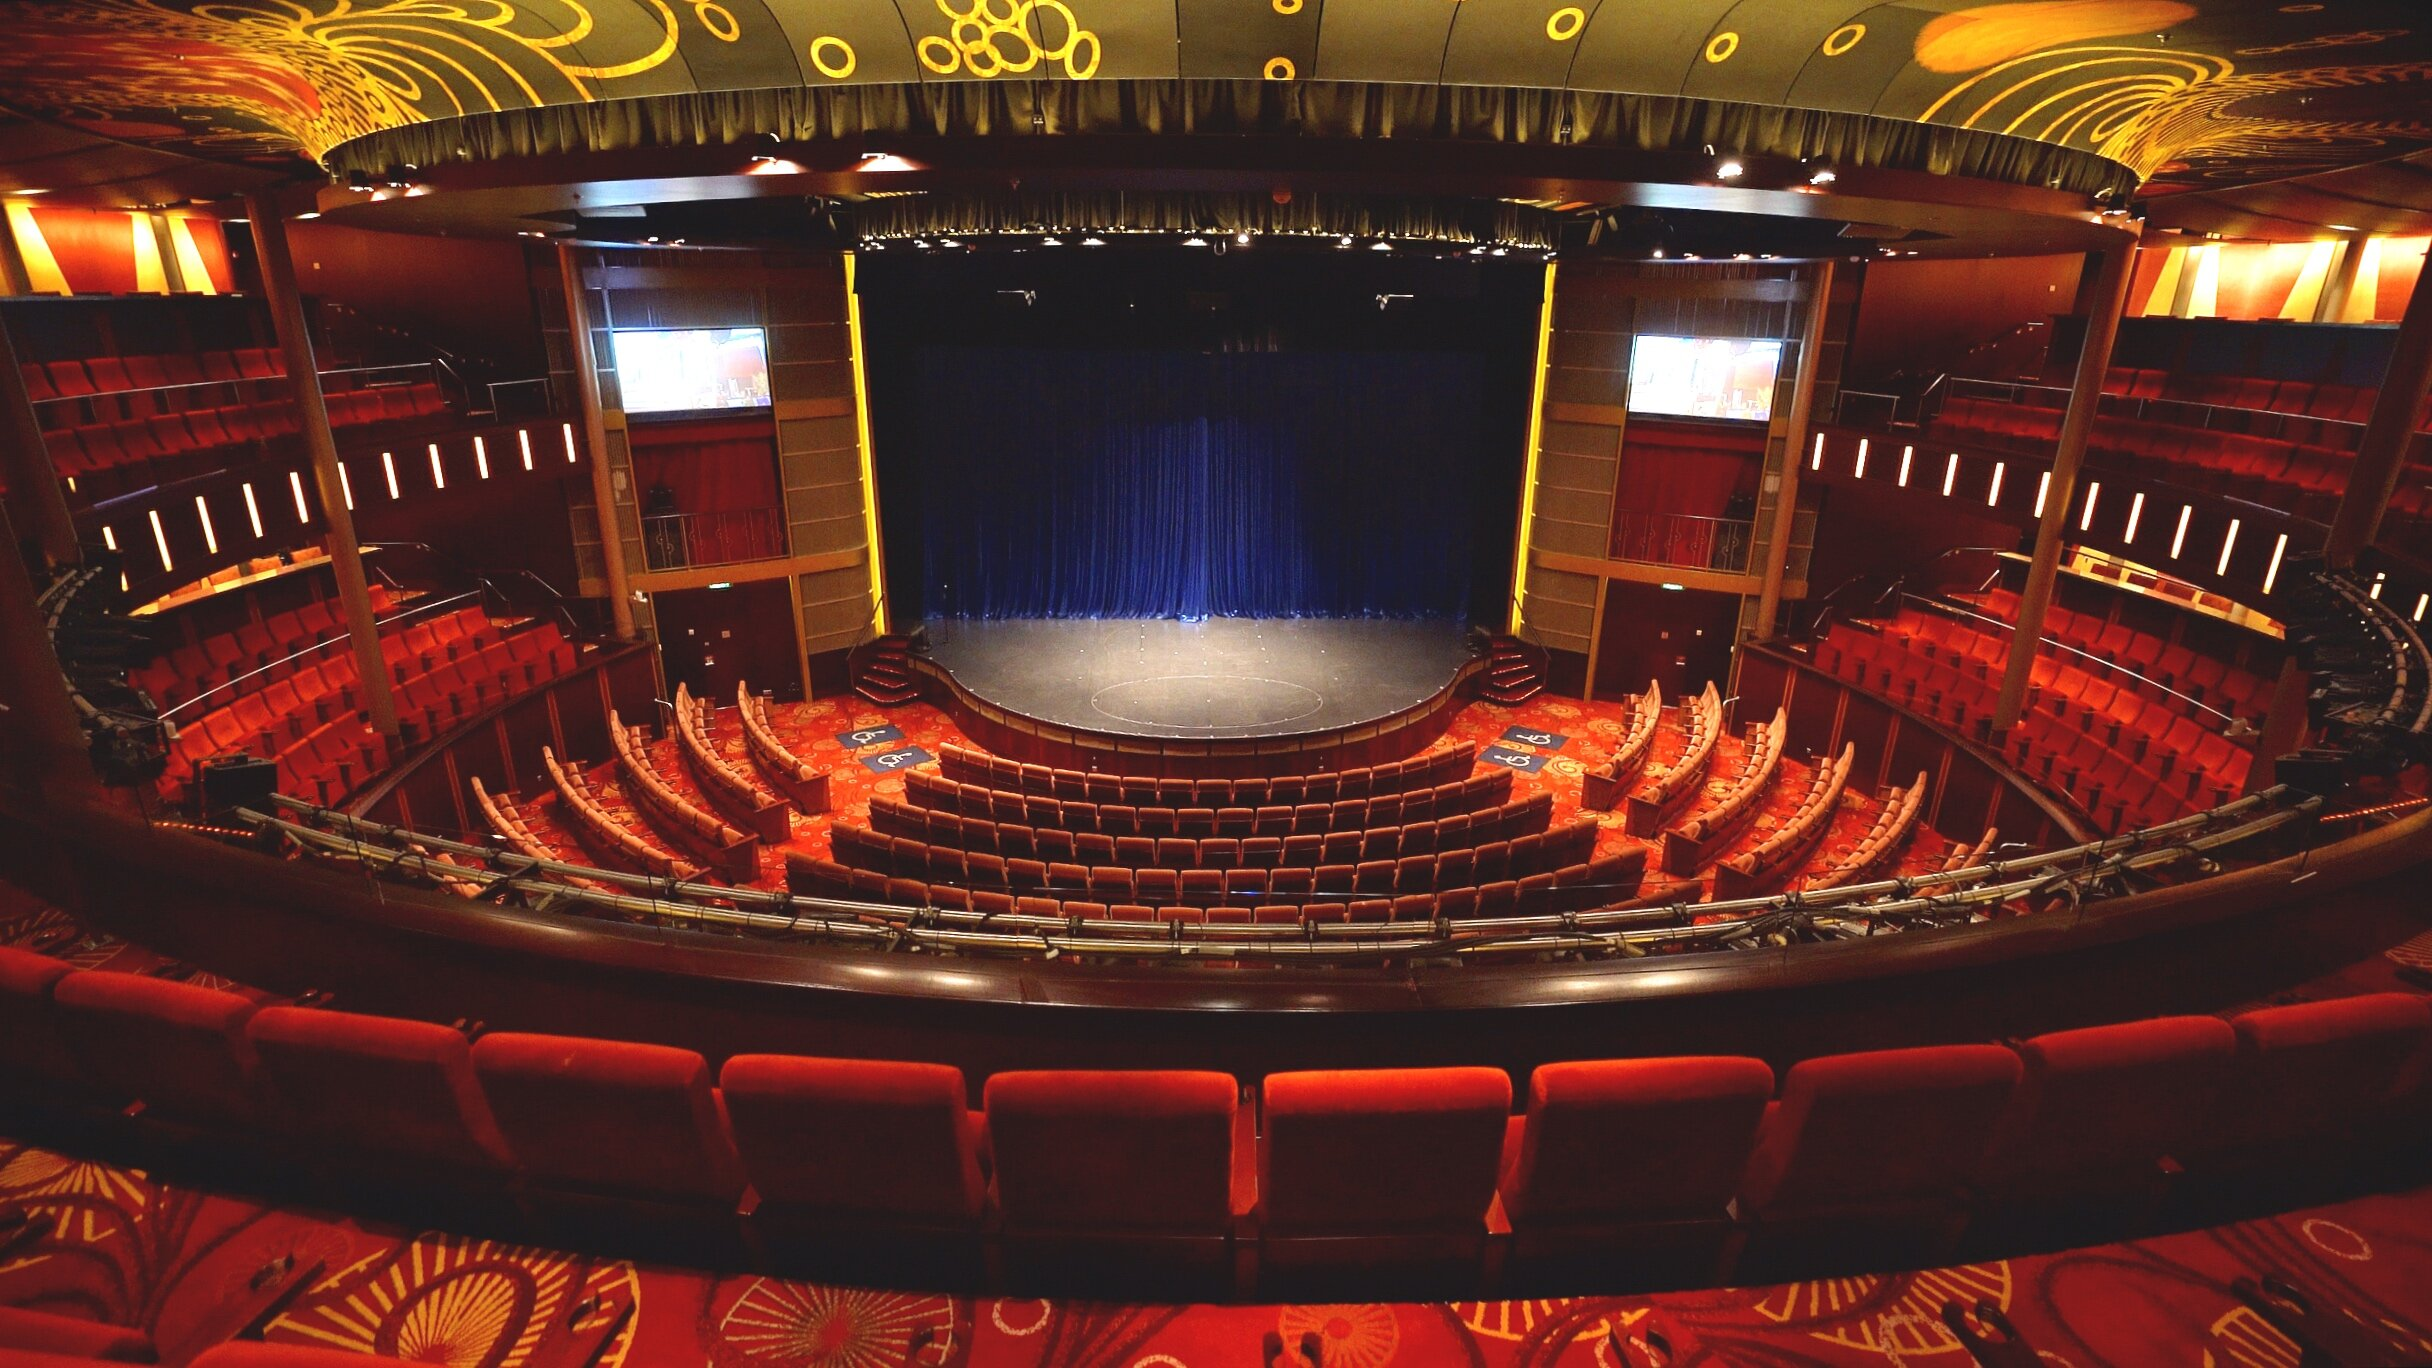 The luscious Silhouette theatre.